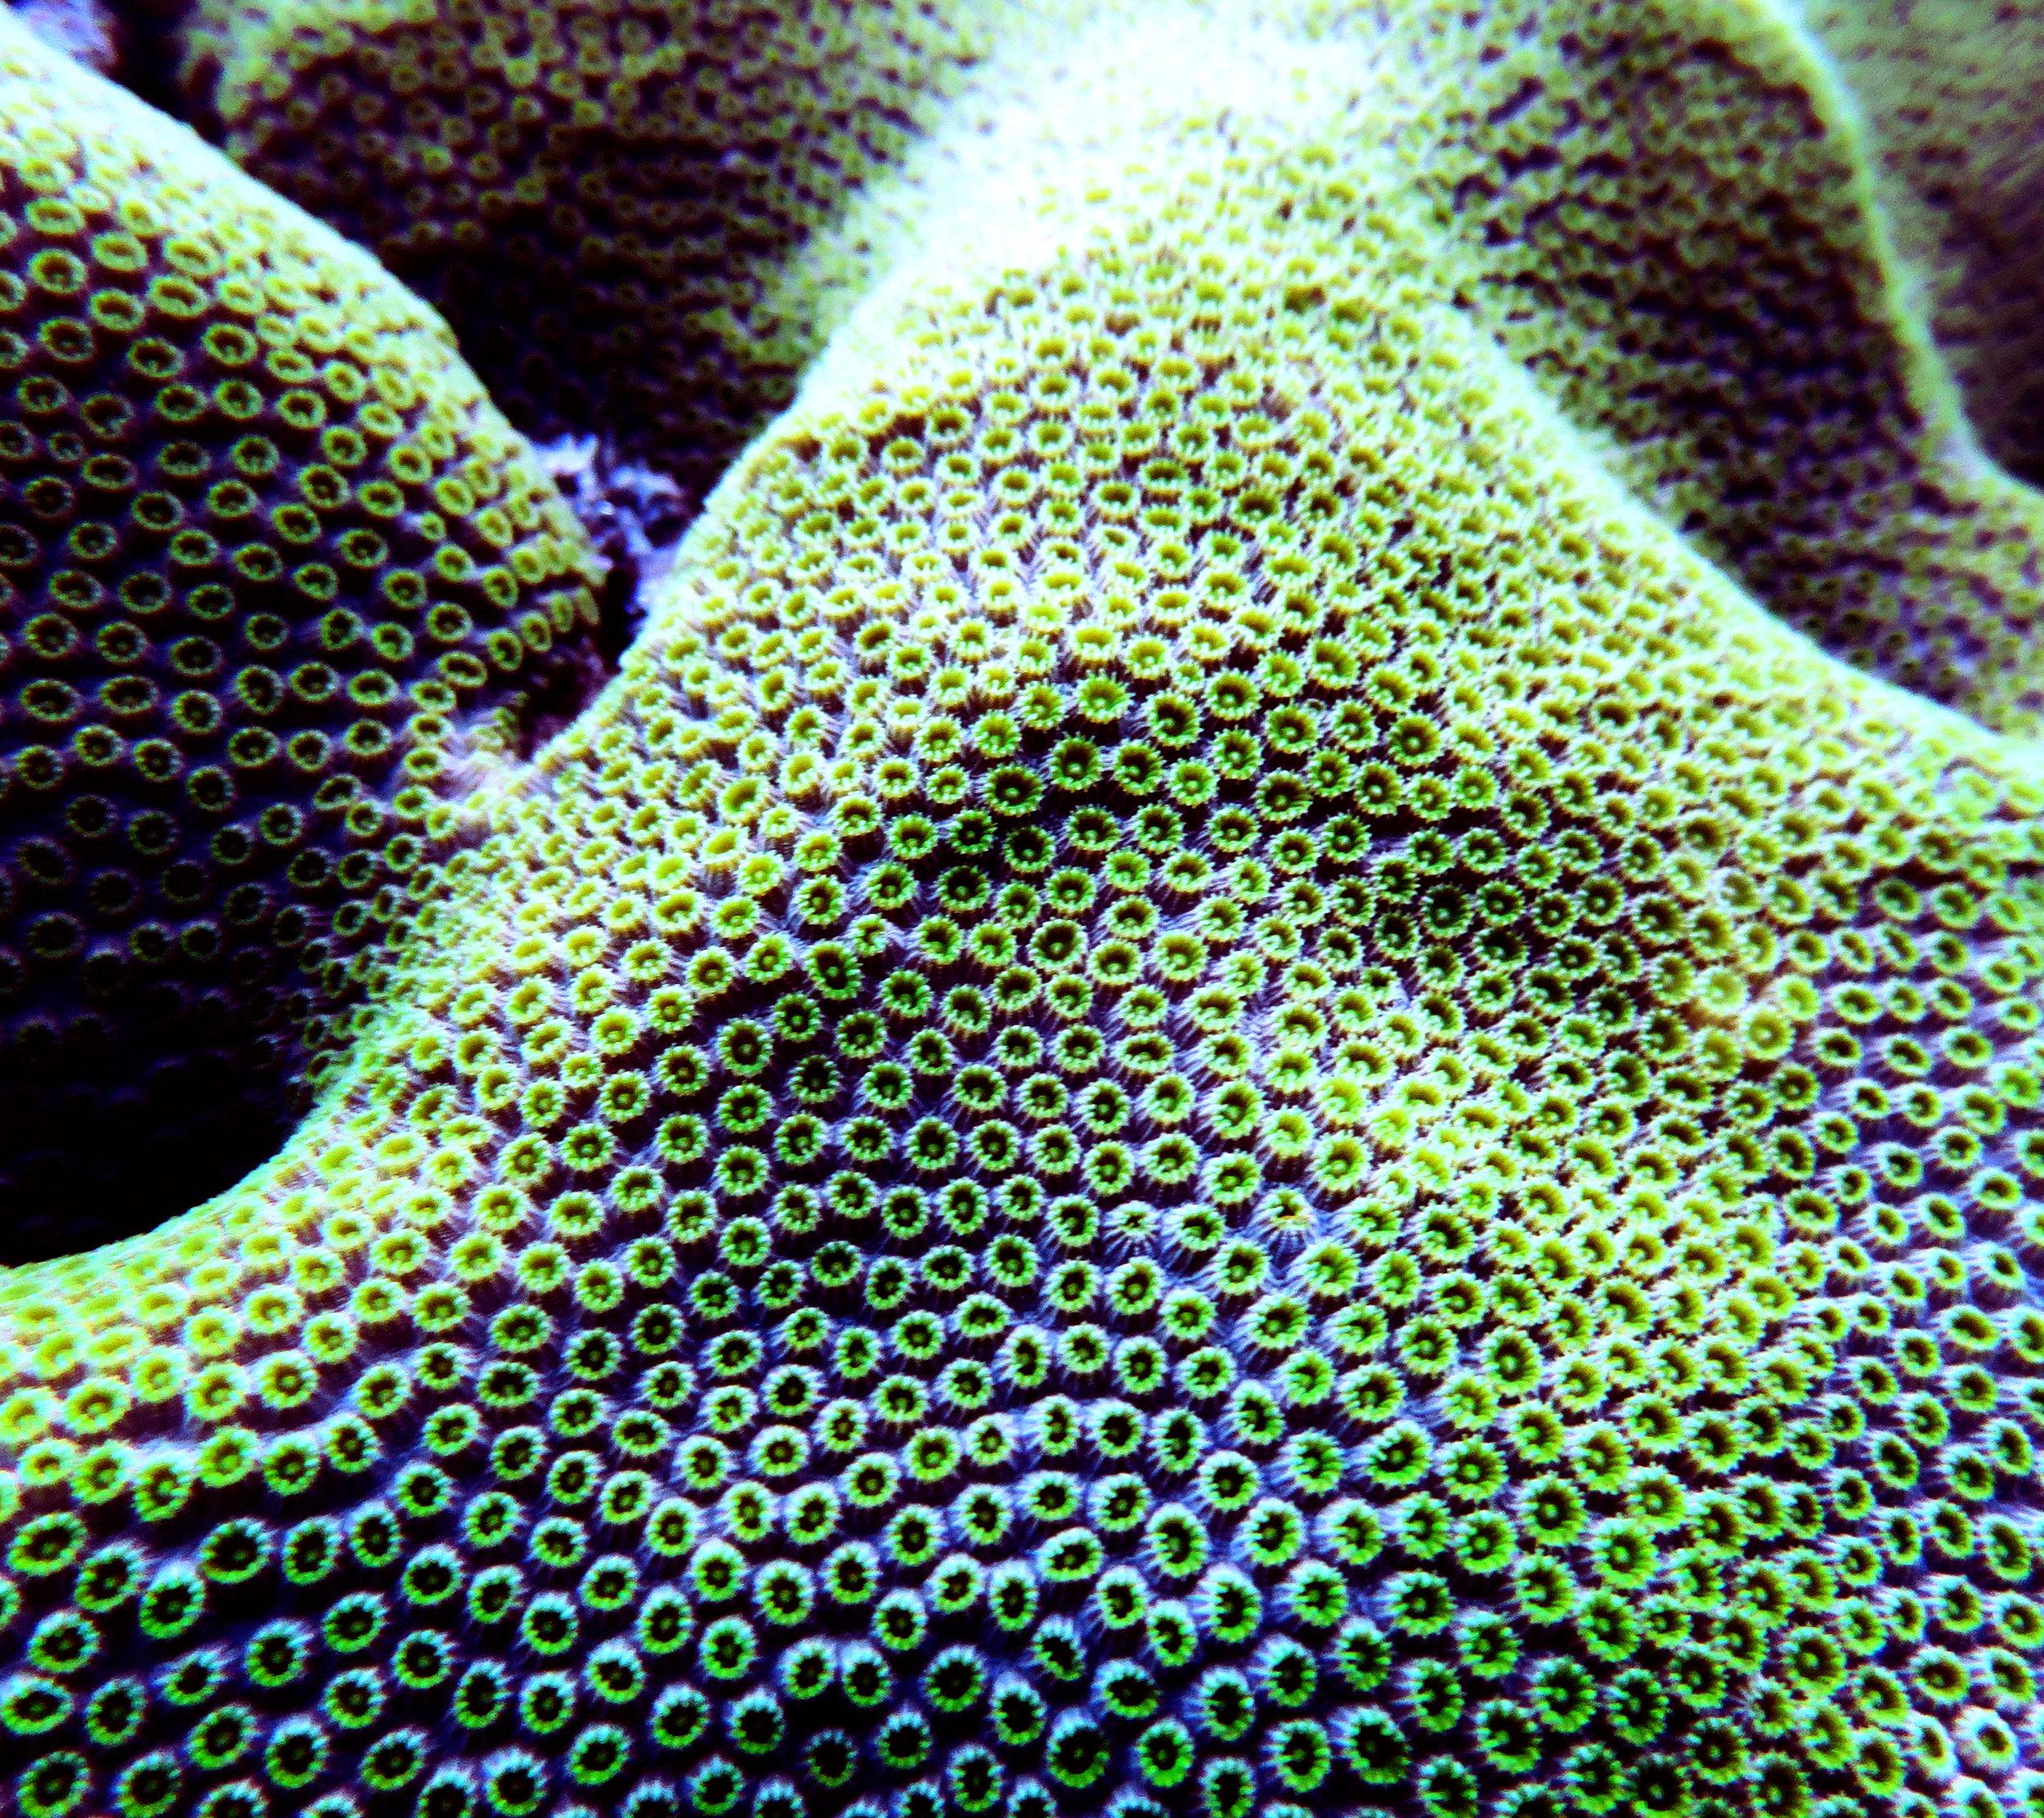 Orbicella faveolata  polyps by day.